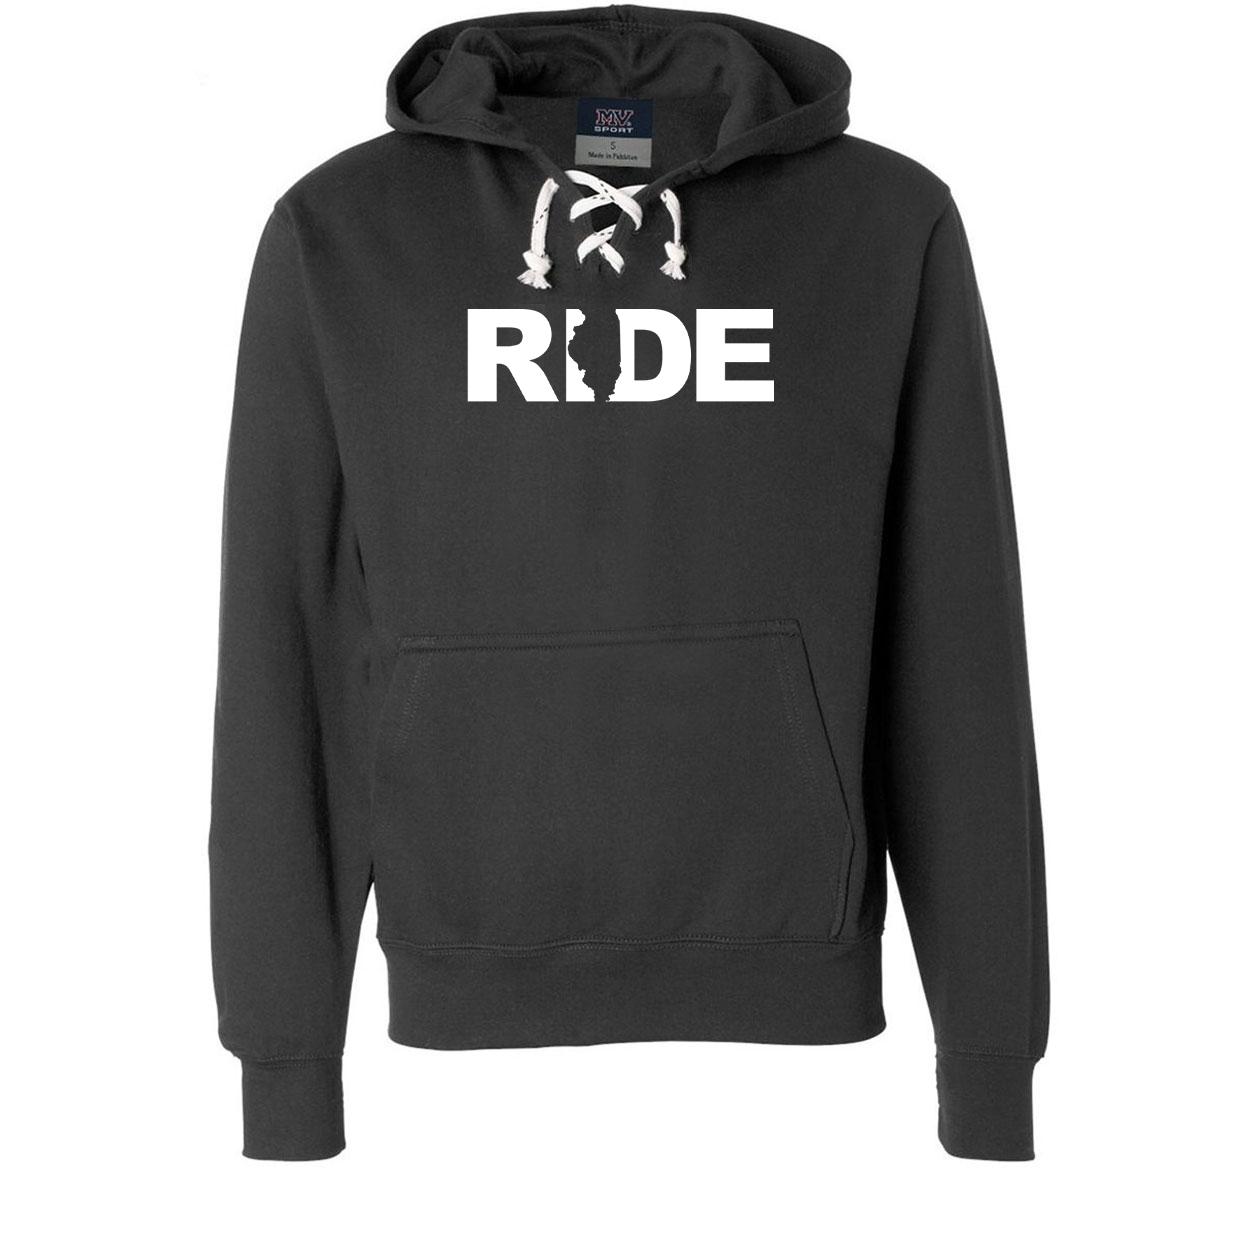 Ride Illinois Classic Unisex Premium Hockey Sweatshirt Black (White Logo)